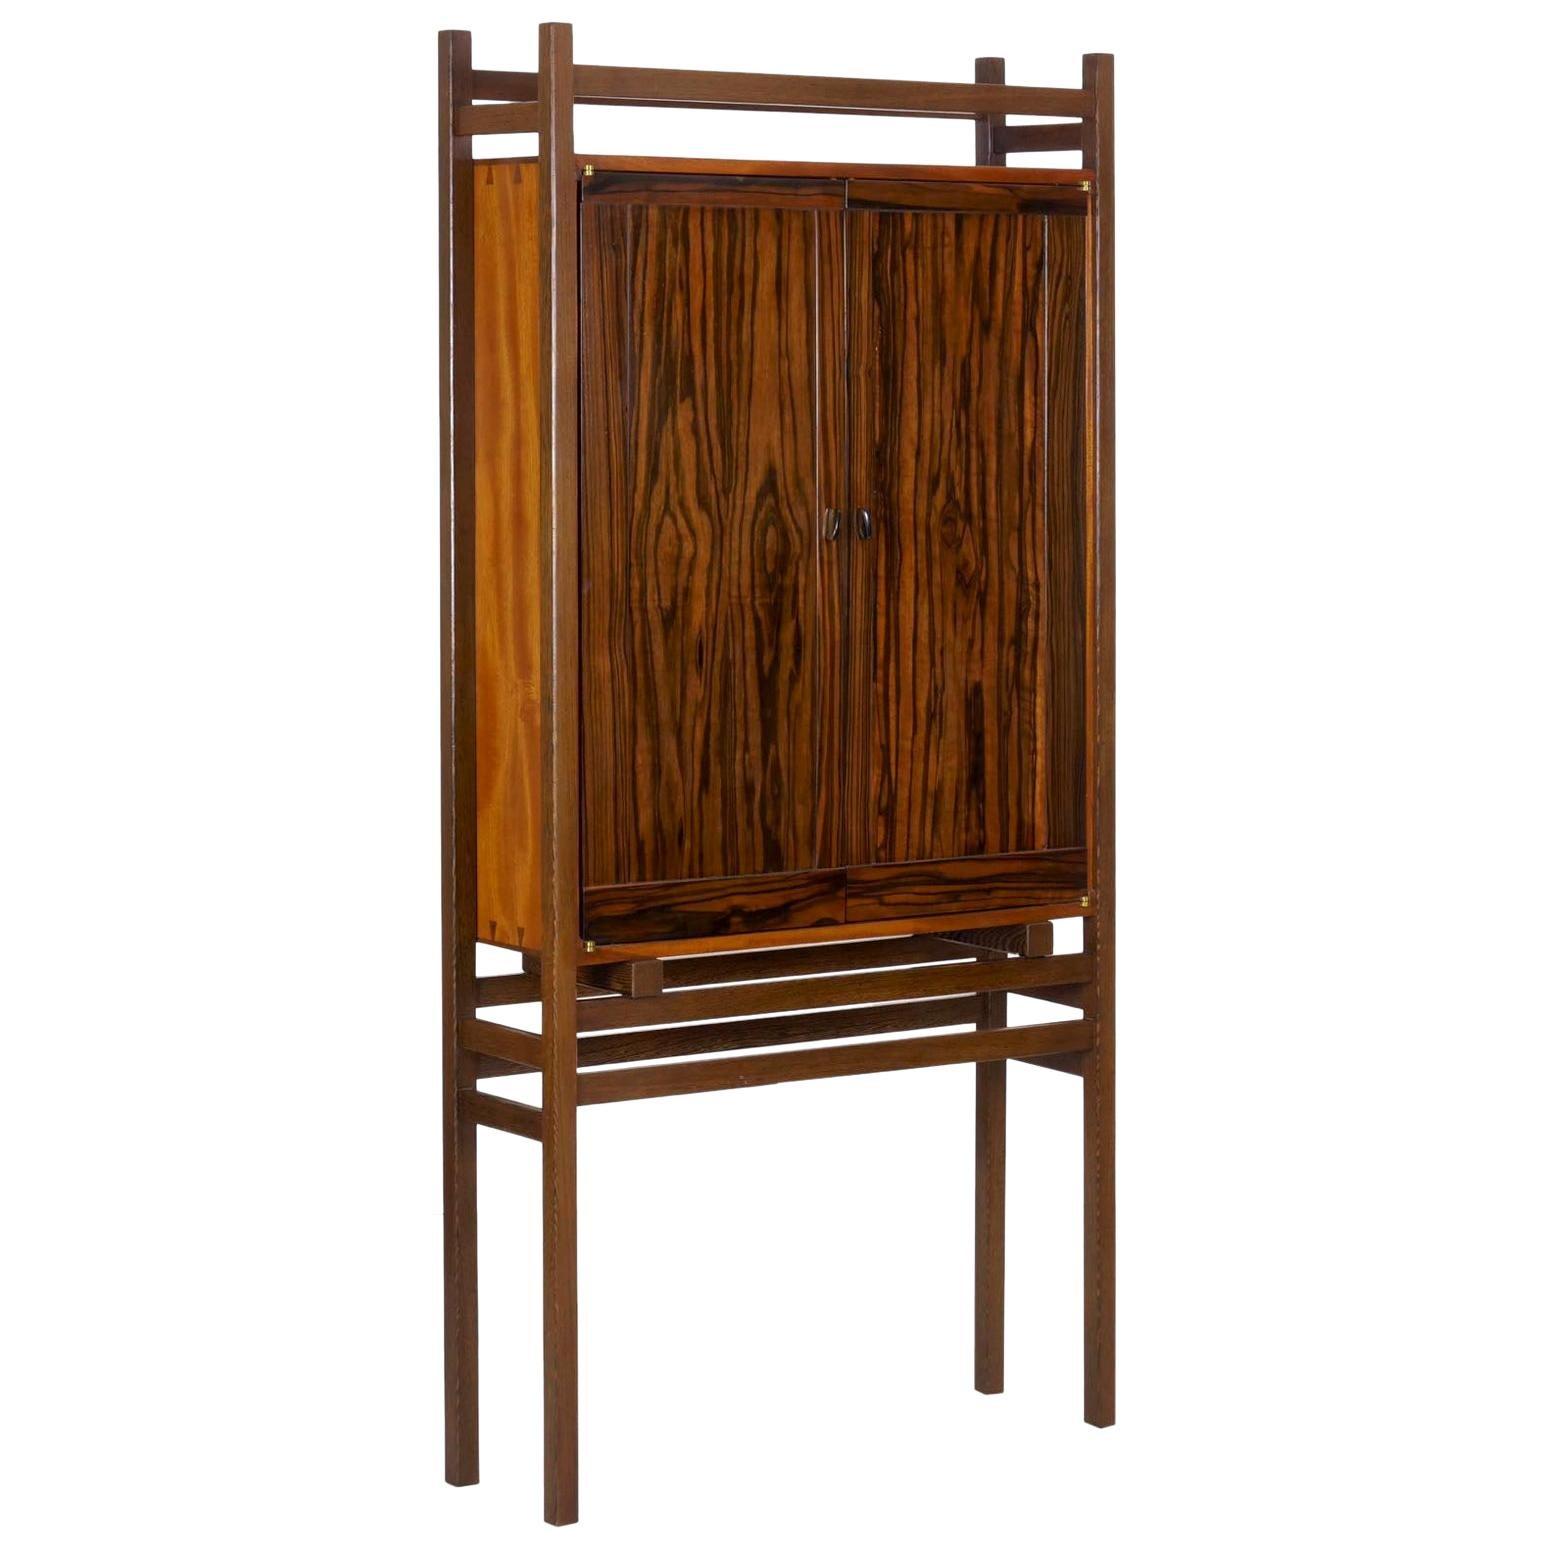 Modern Freestanding Dovetailed Mahogany and Ebony Bookcase Cabinet by John Hein